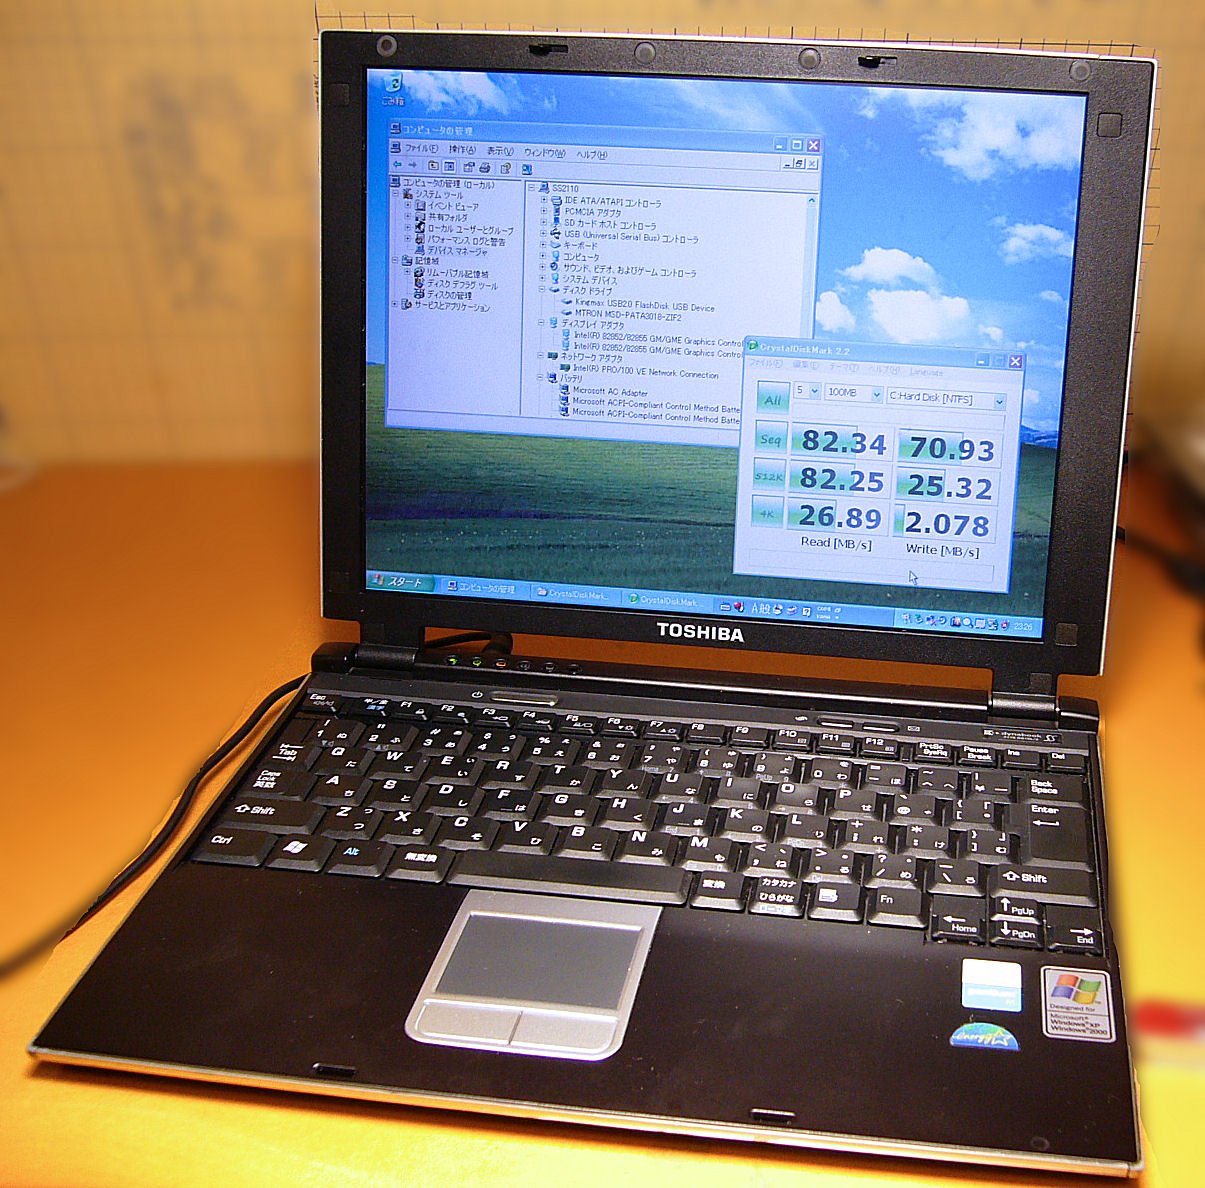 Toshiba dynabook Satellite B450/C Drivers